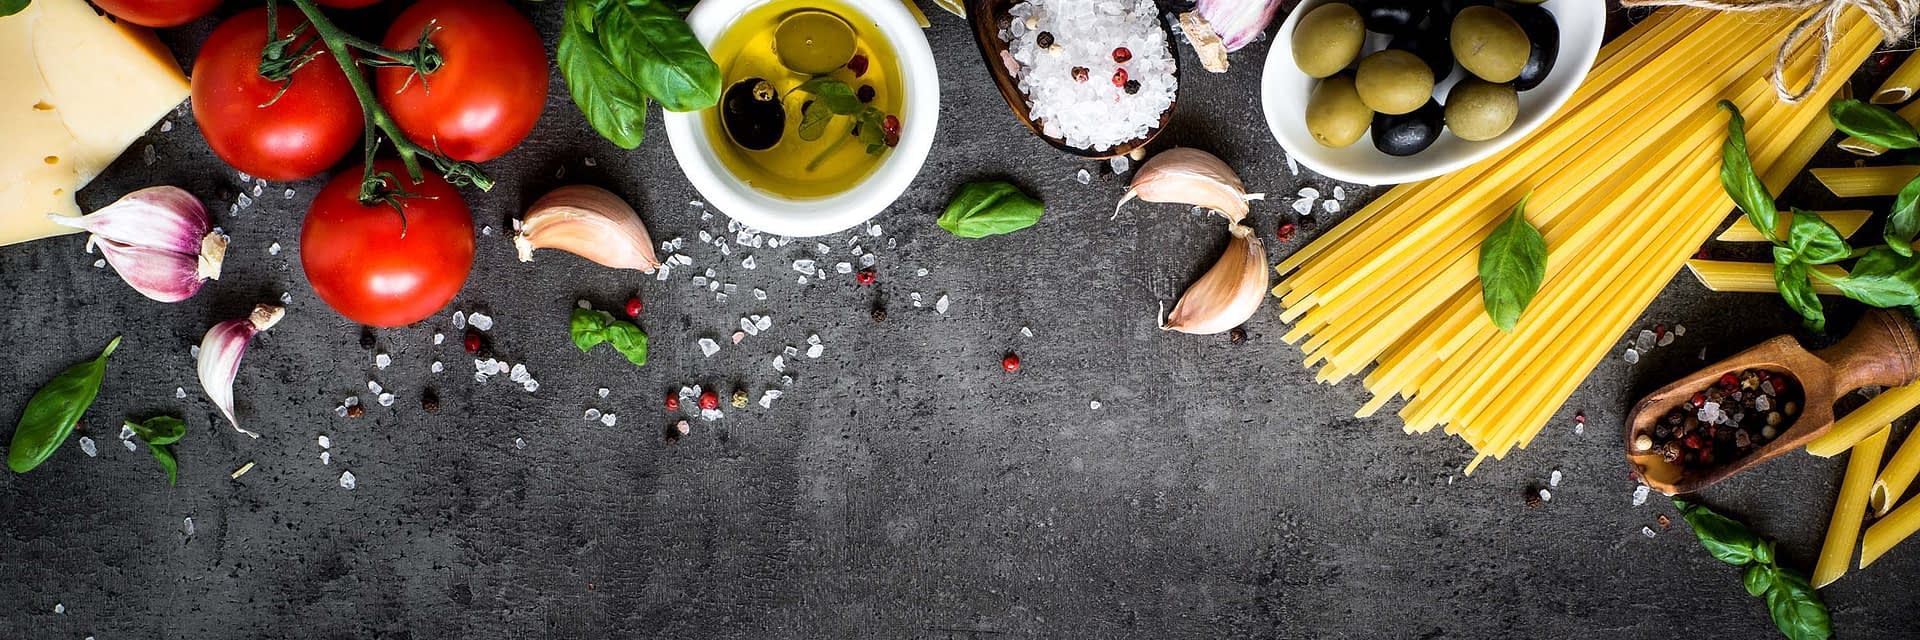 Italian Restaurant Boca Raton Weekly Specials